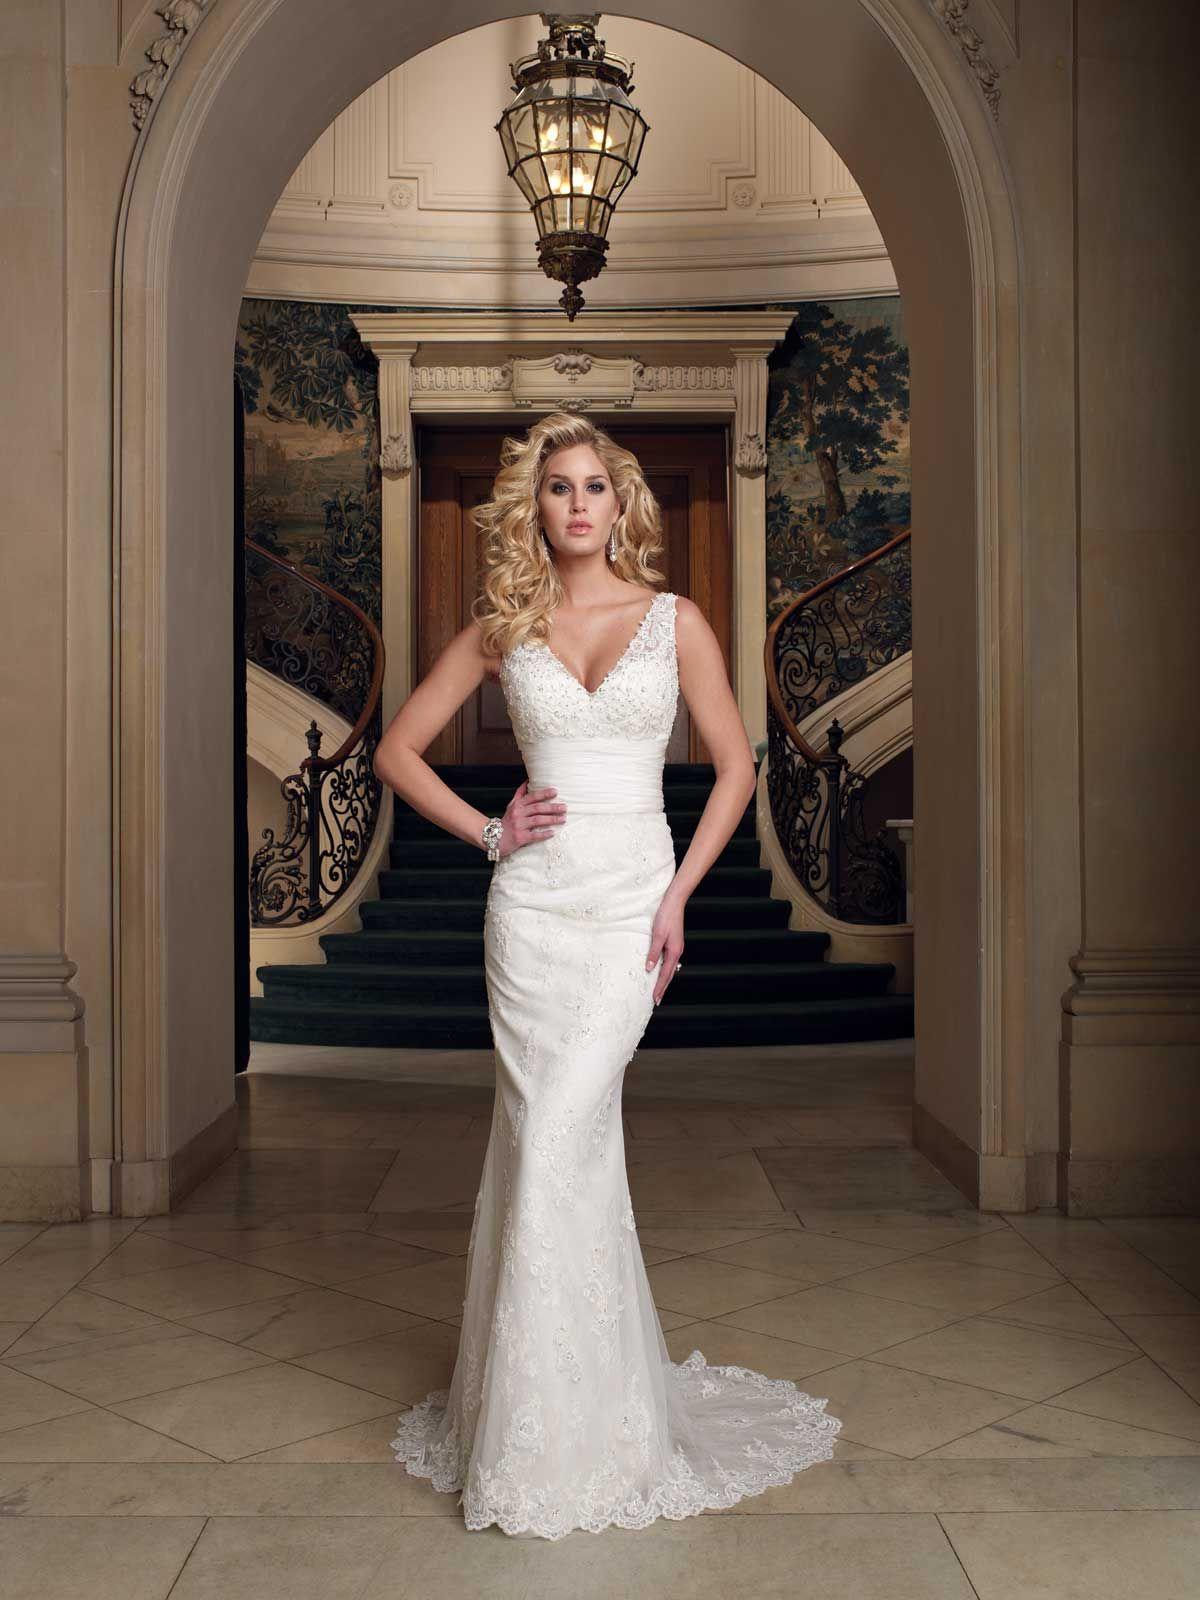 2017 Designer Wedding Dresses & Bridal Gowns | David tutera, Bridal ...